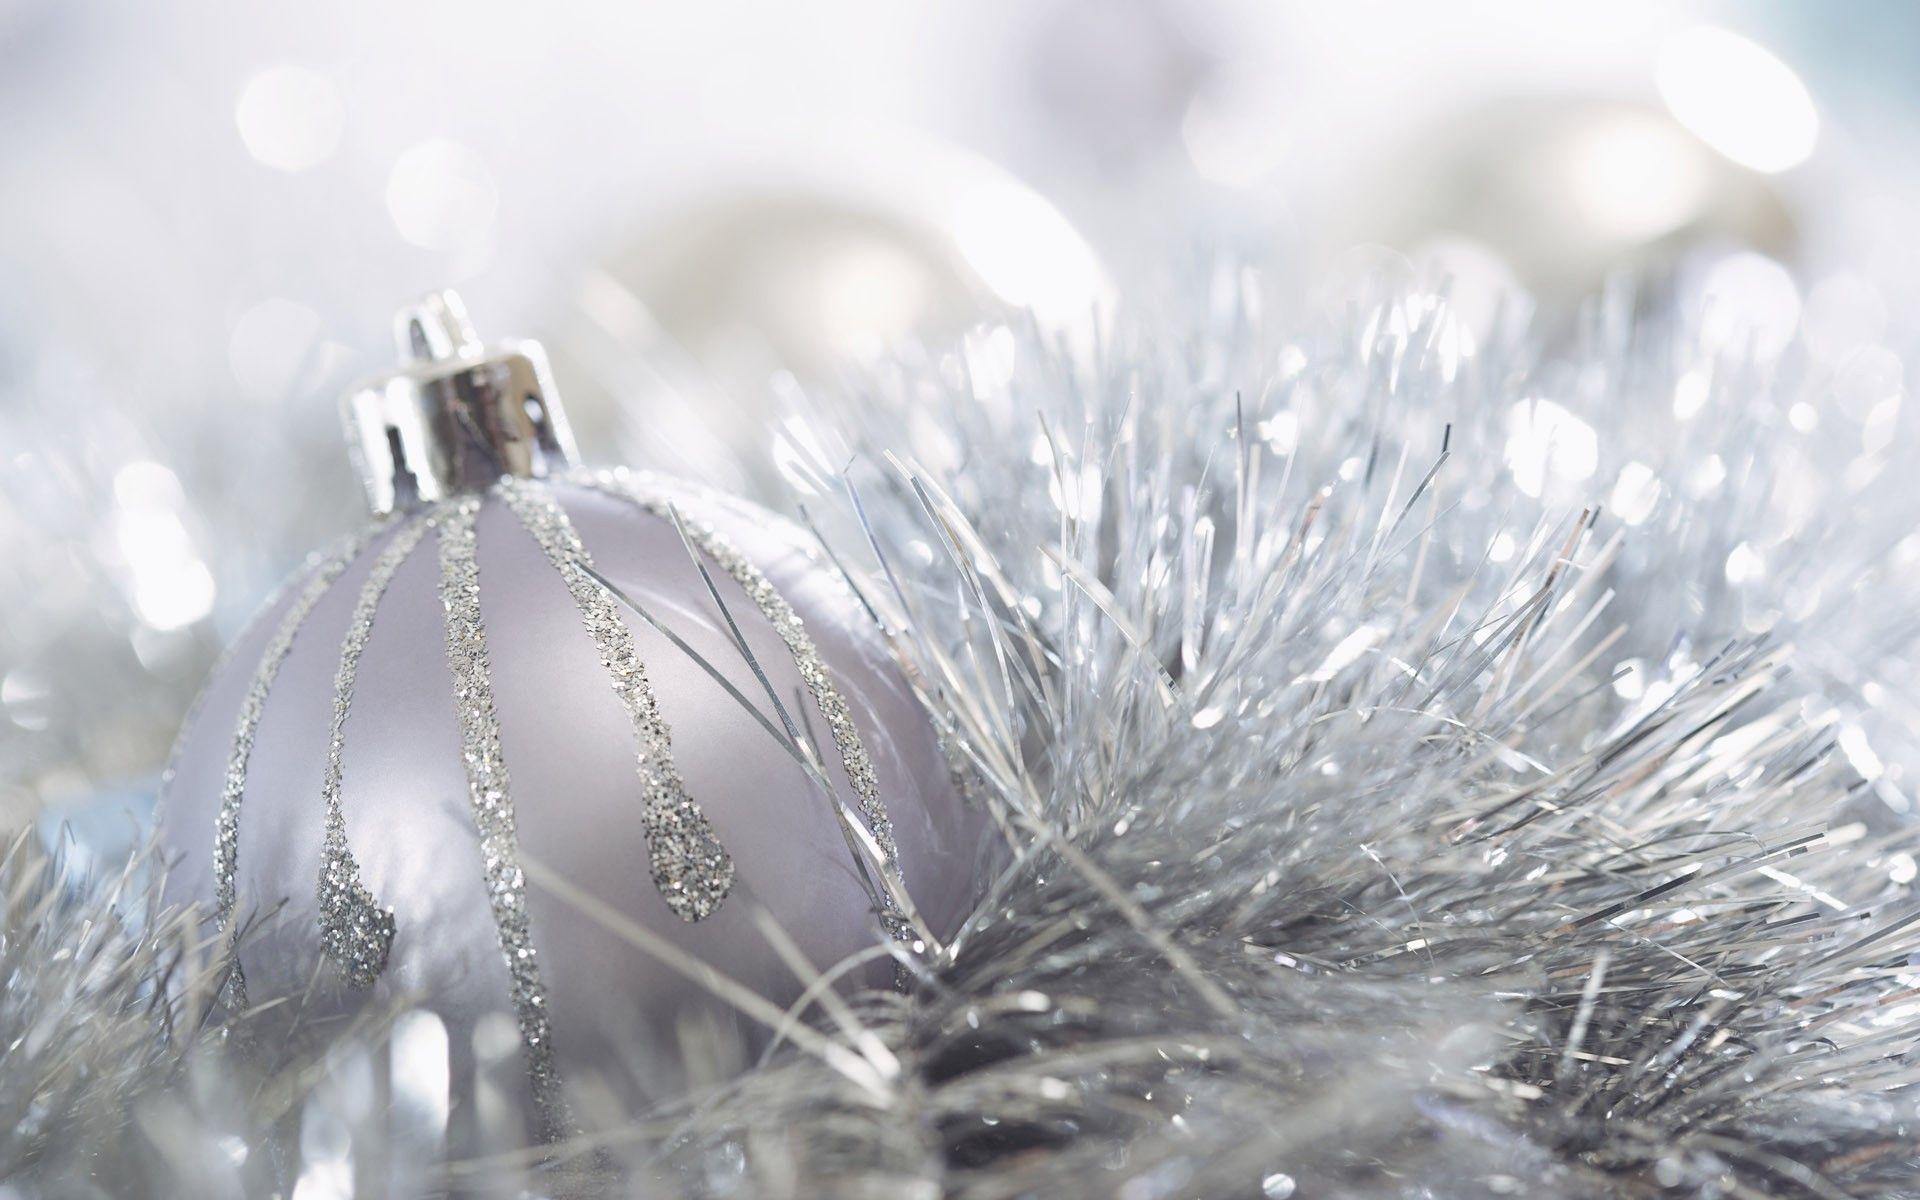 White Christmas Wallpapers Free White Christmas Desktop Backgrounds White Christmas Ornaments Silver Christmas Decorations White Christmas Lights